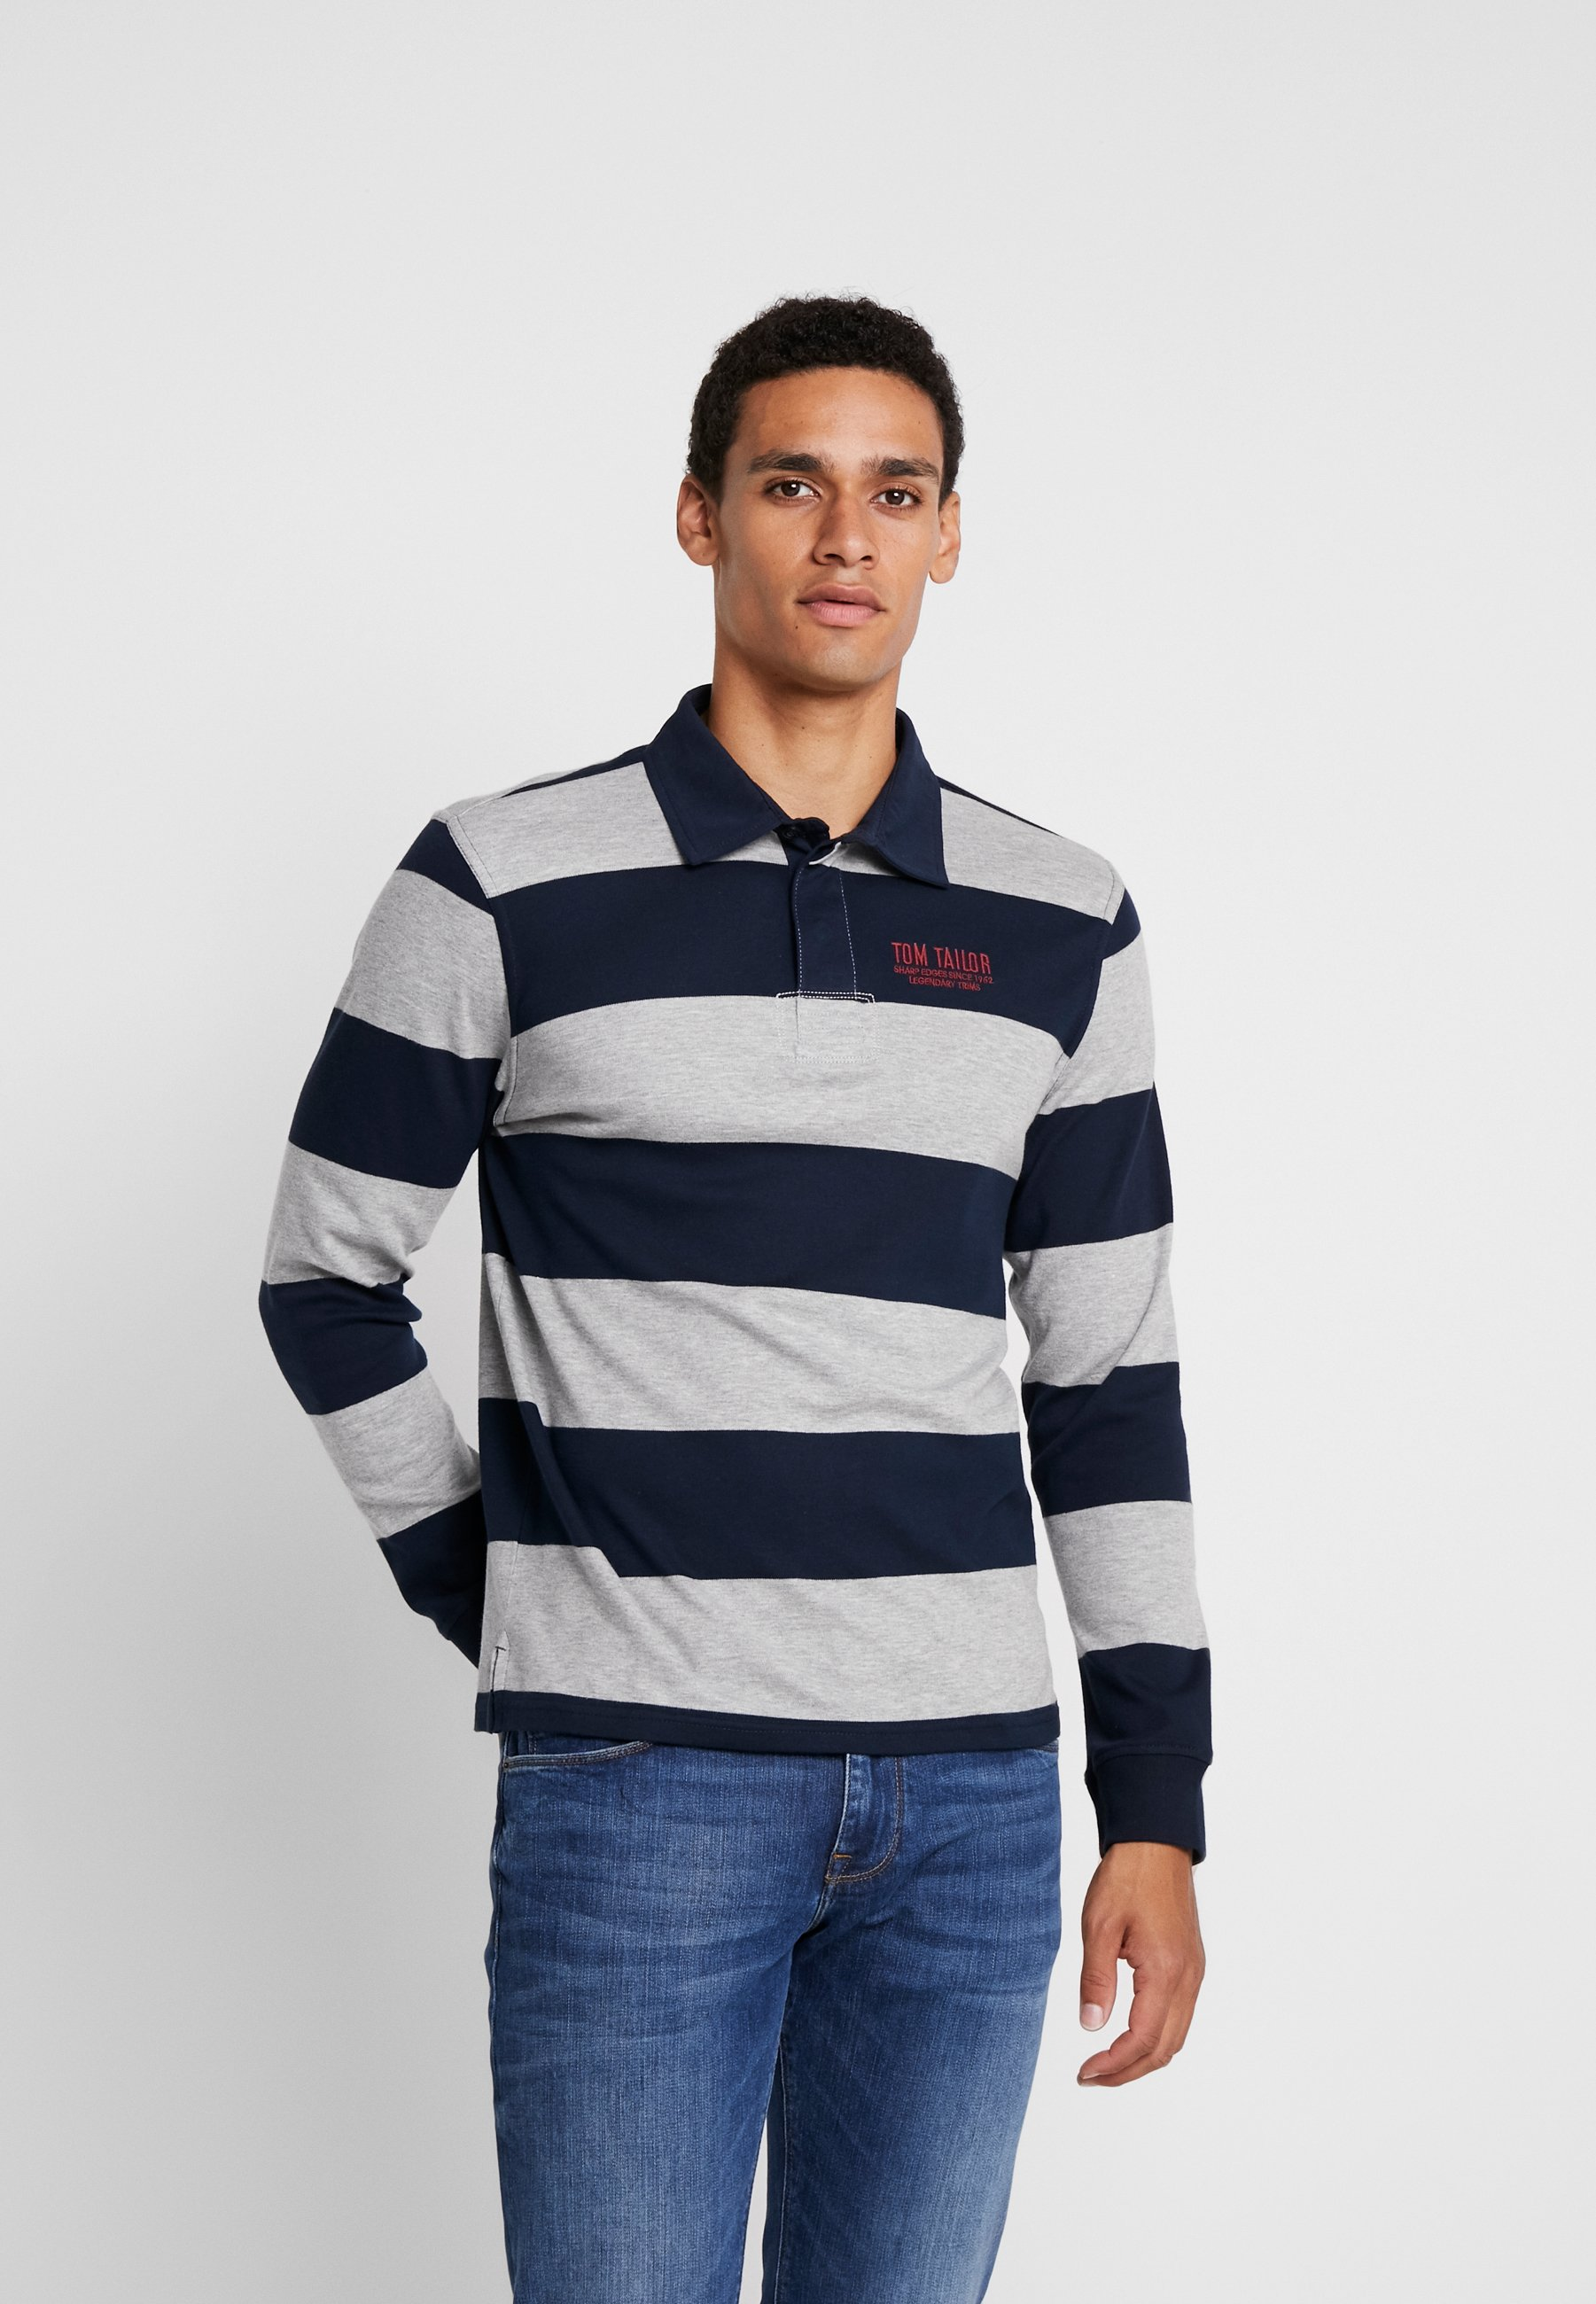 Tailor Grey Tom LongsleevePolo Tailor Striped Striped Tom LongsleevePolo OPn0w8k